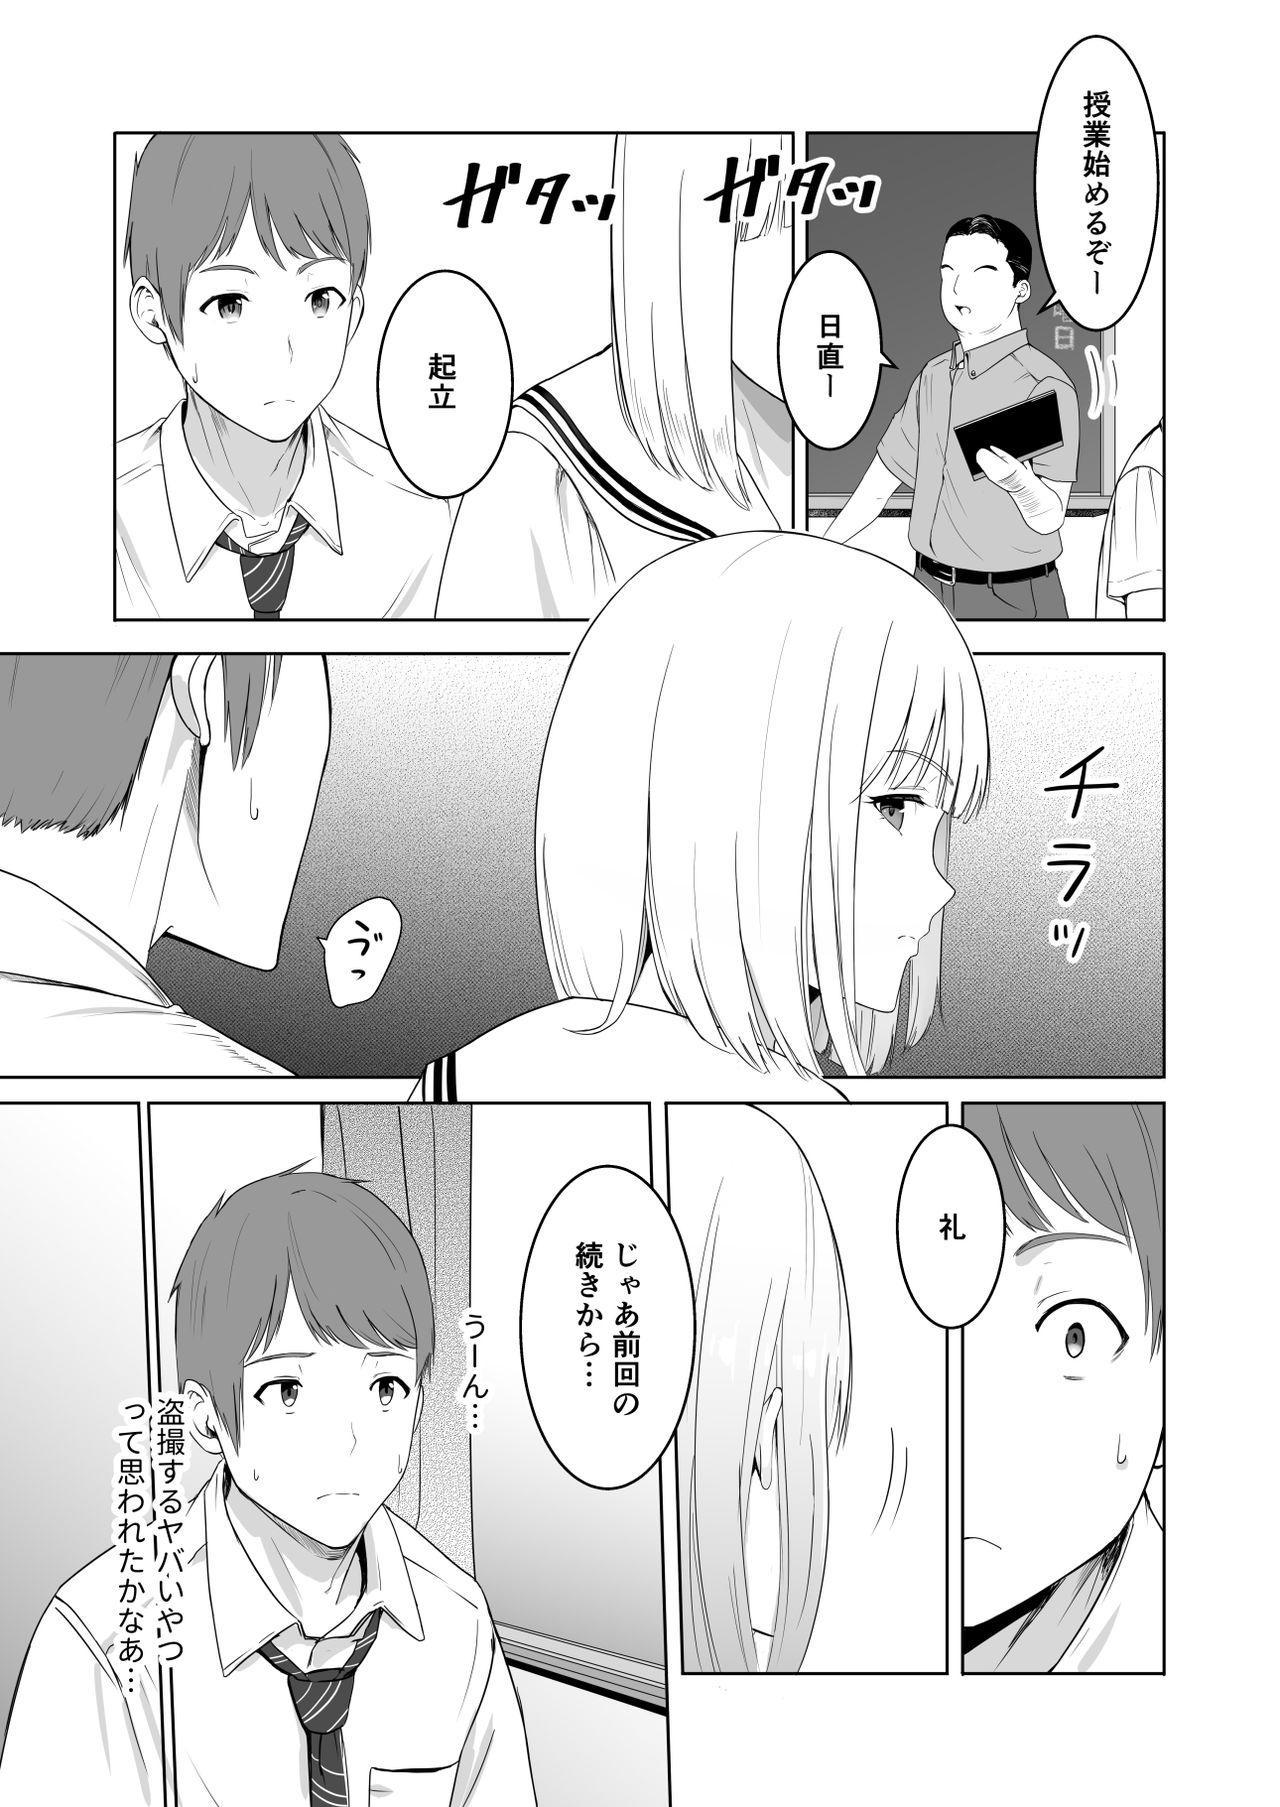 Kimi ga Tame. 2 Ichikawa Inori 11